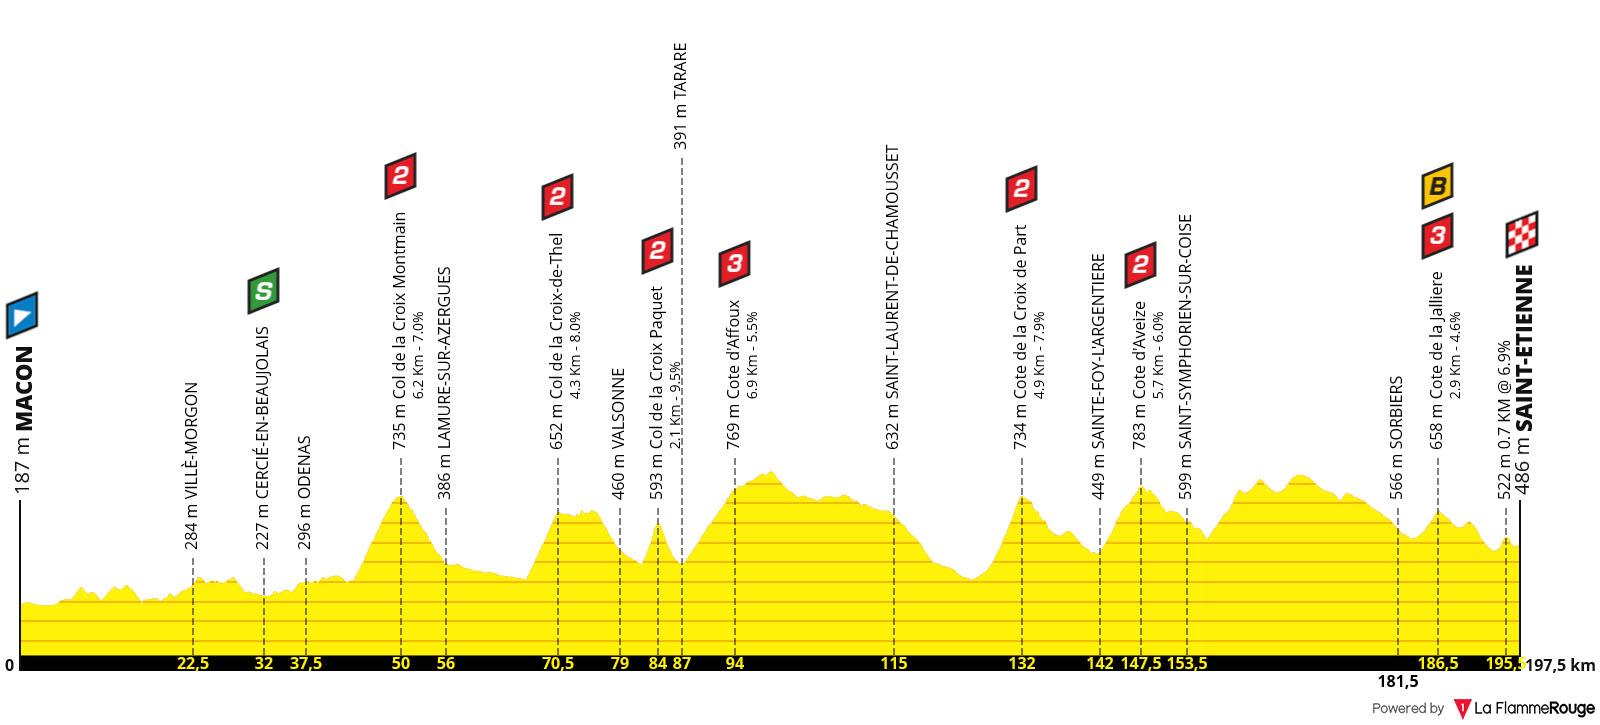 Perfil Etapa 08 - Tour de Francia 2019